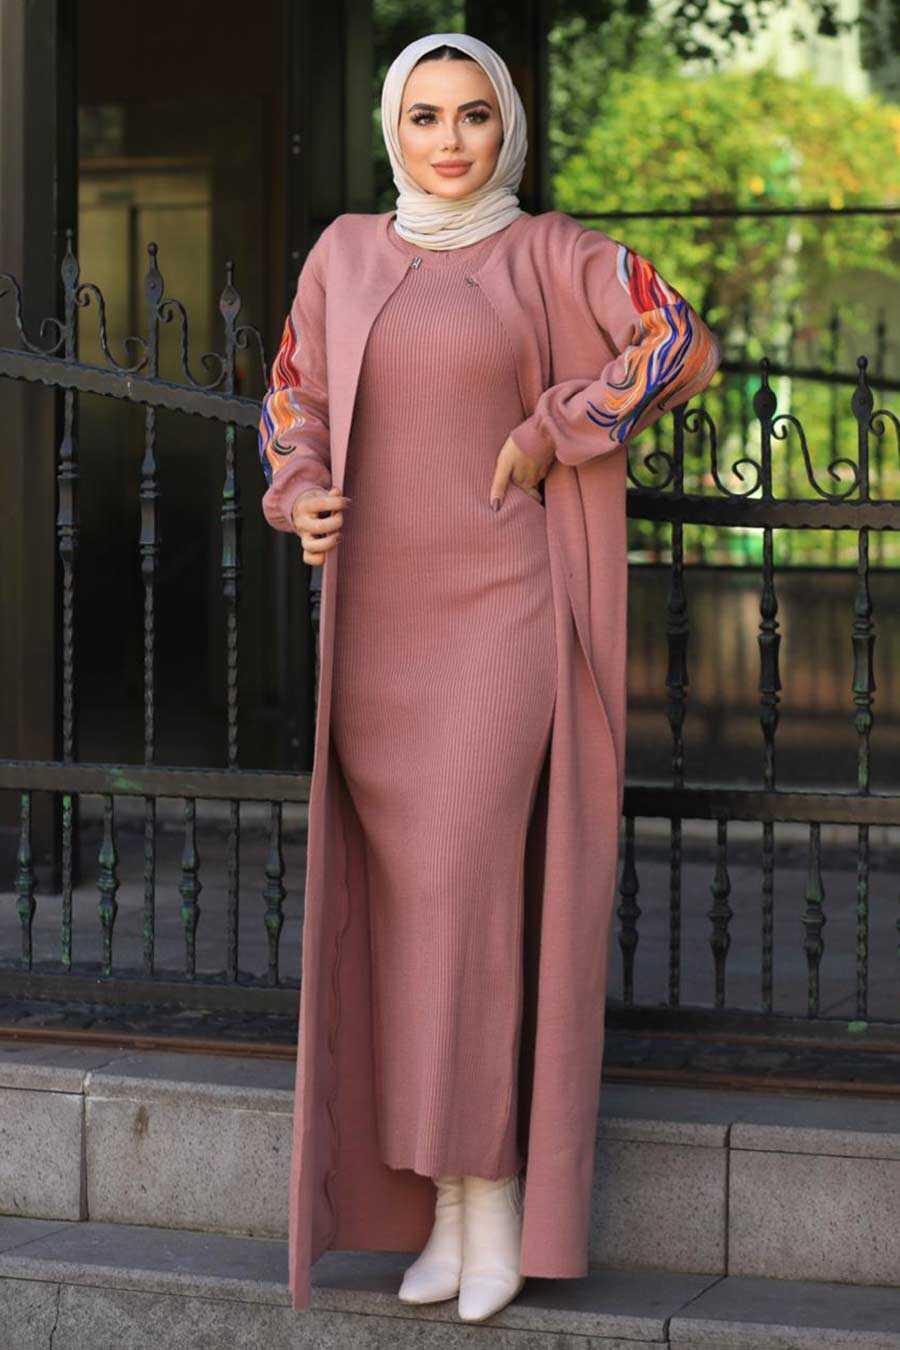 Dusty Rose Hijab Dual Suit Dress 2200GK